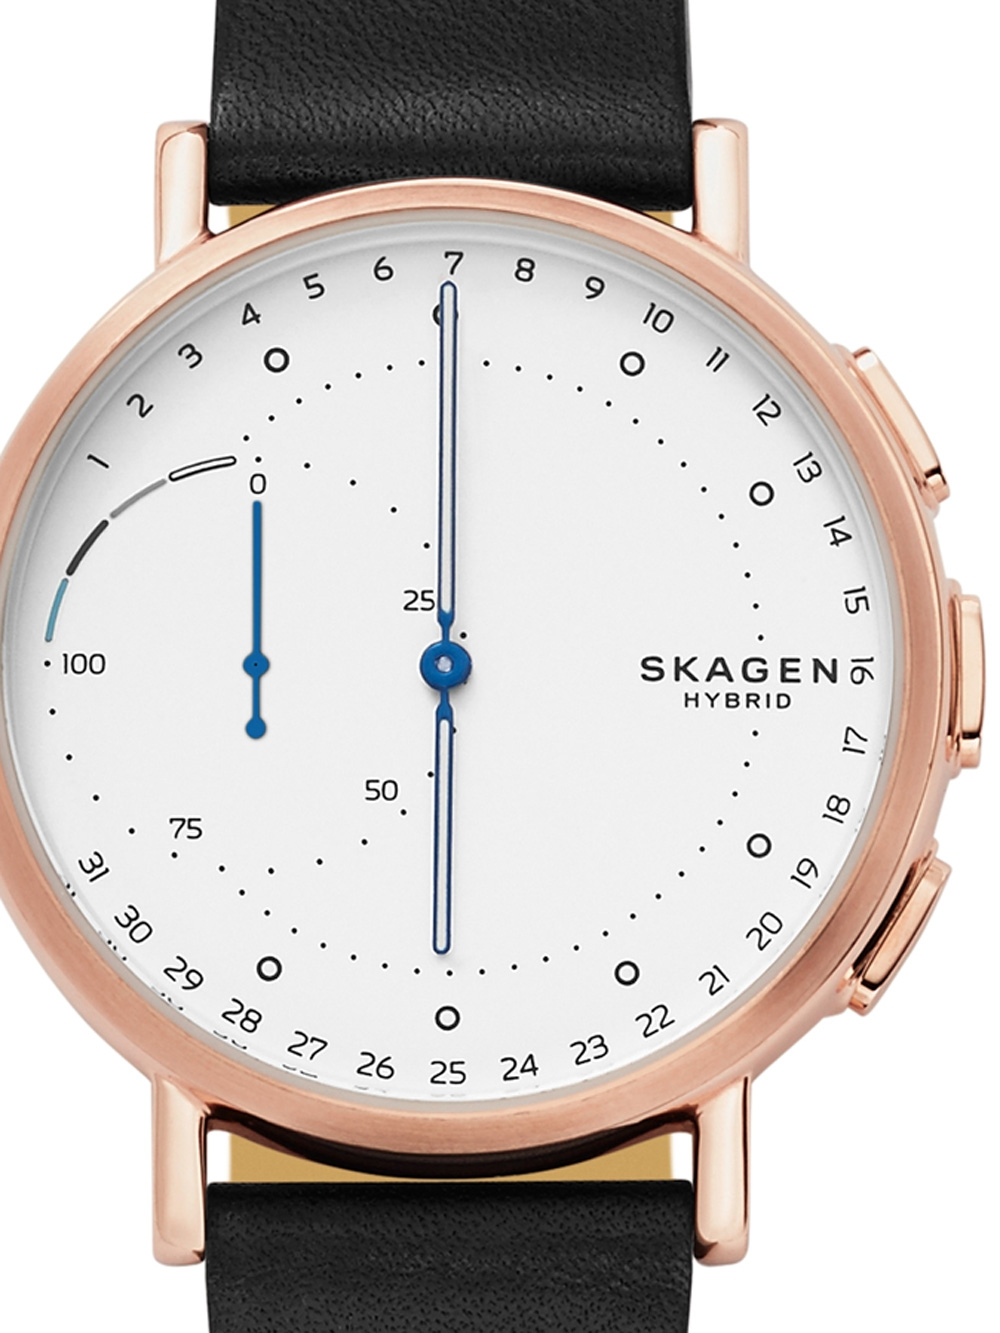 Skagen SKT1112 Signatur Hybrid Smartwatch 42mm 3ATM